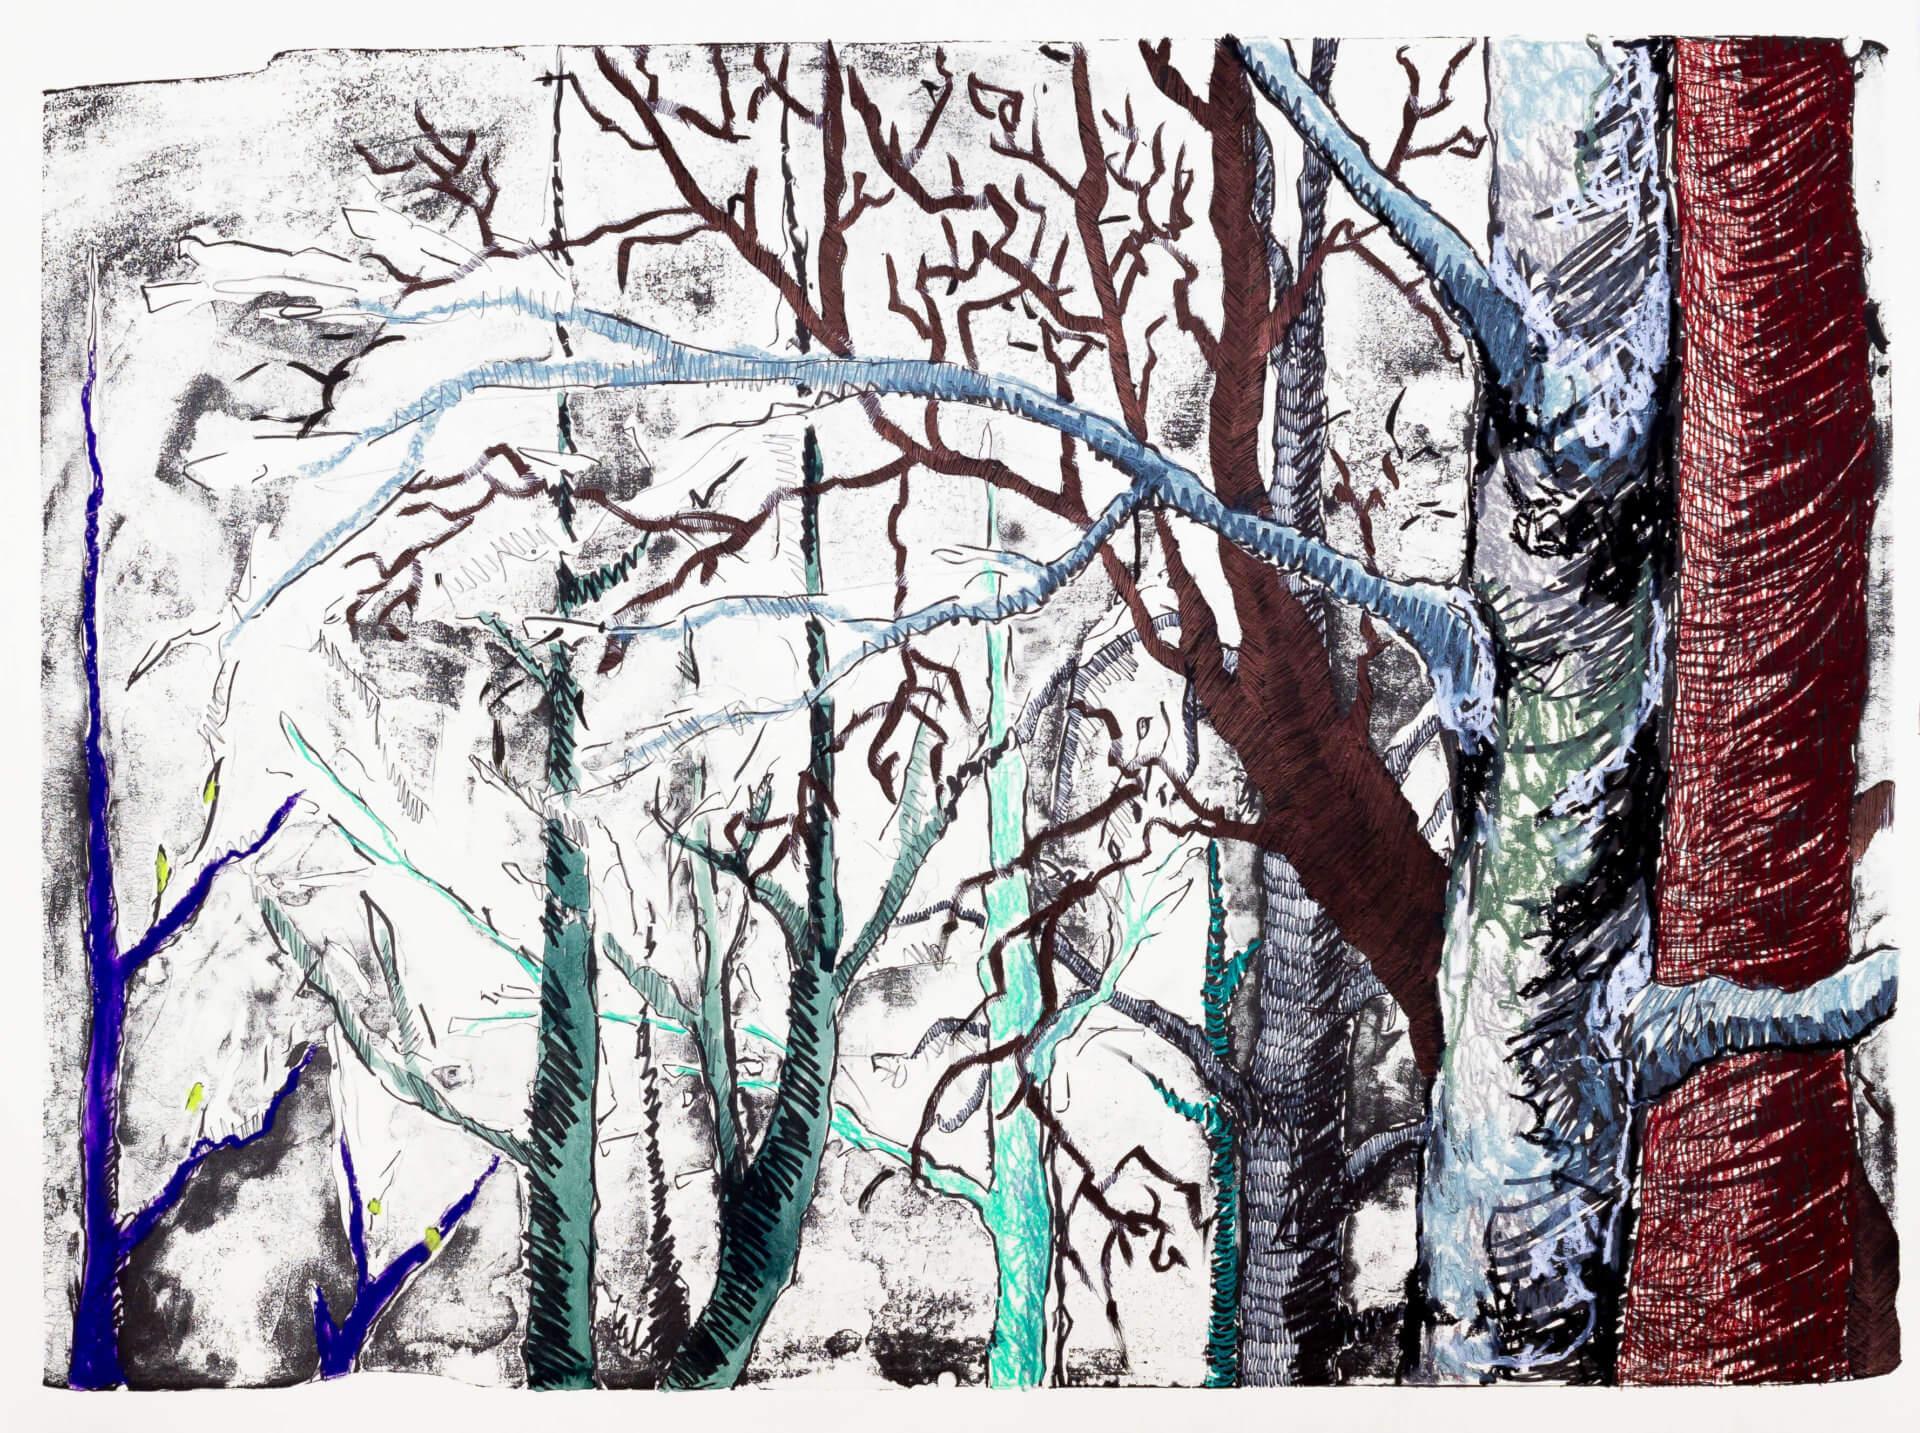 Katharina Albers, Wald (F_B)(E), 2016, Lithographie handkoloriert (Ölkreide, Graphit, Aquarellfarbe, Fineliner, Gelstift, Tusche), Unikat, 70×100 cm